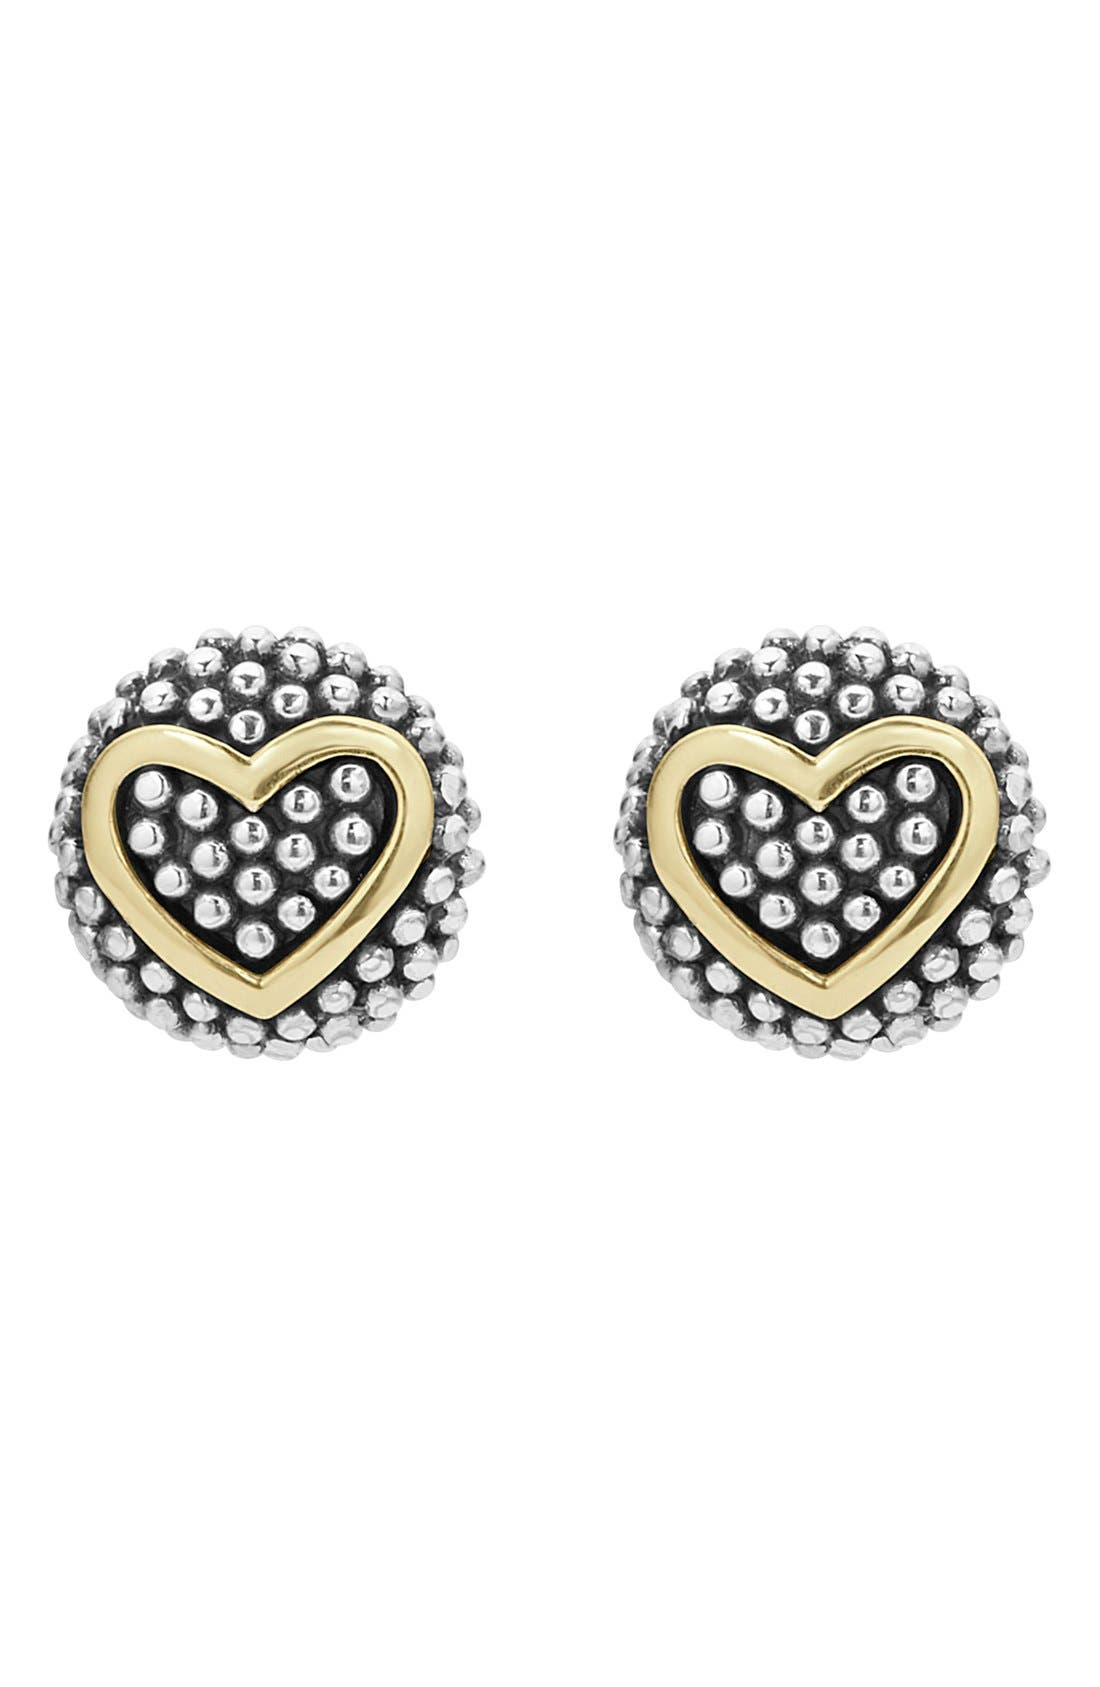 'Caviar' Heart Stud Earrings,                         Main,                         color, SILVER/ GOLD